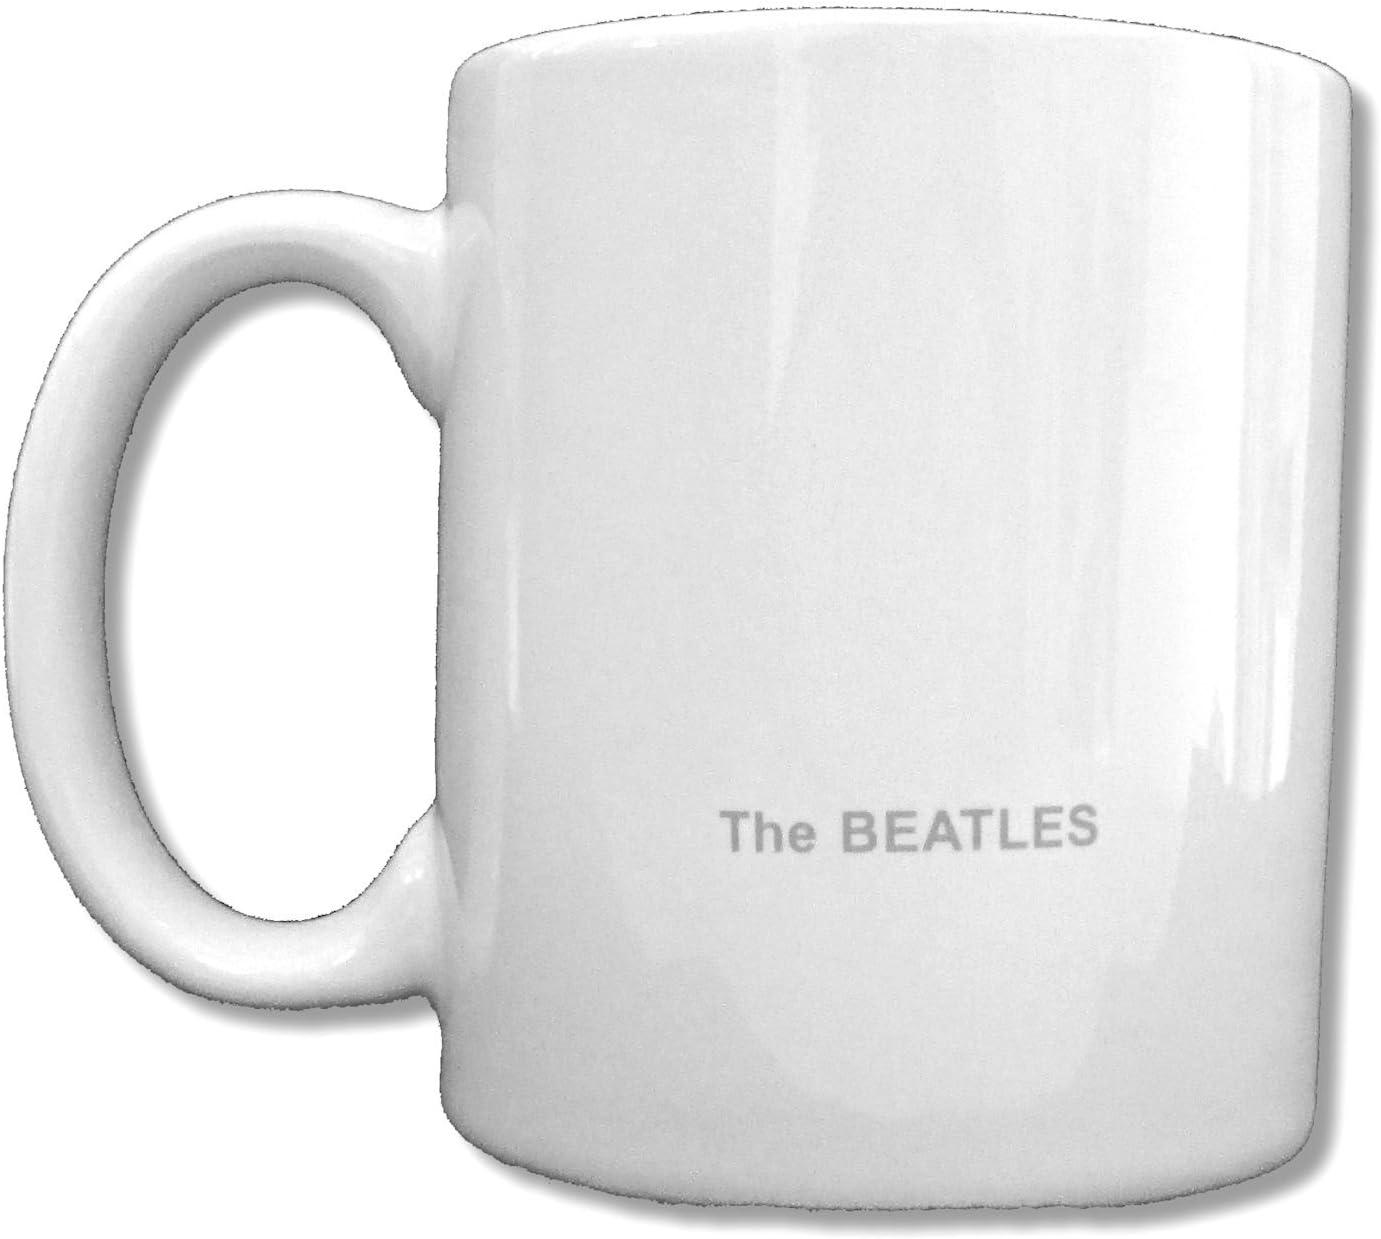 Beatles White Album White Ceramic Collectible Coffee Mug